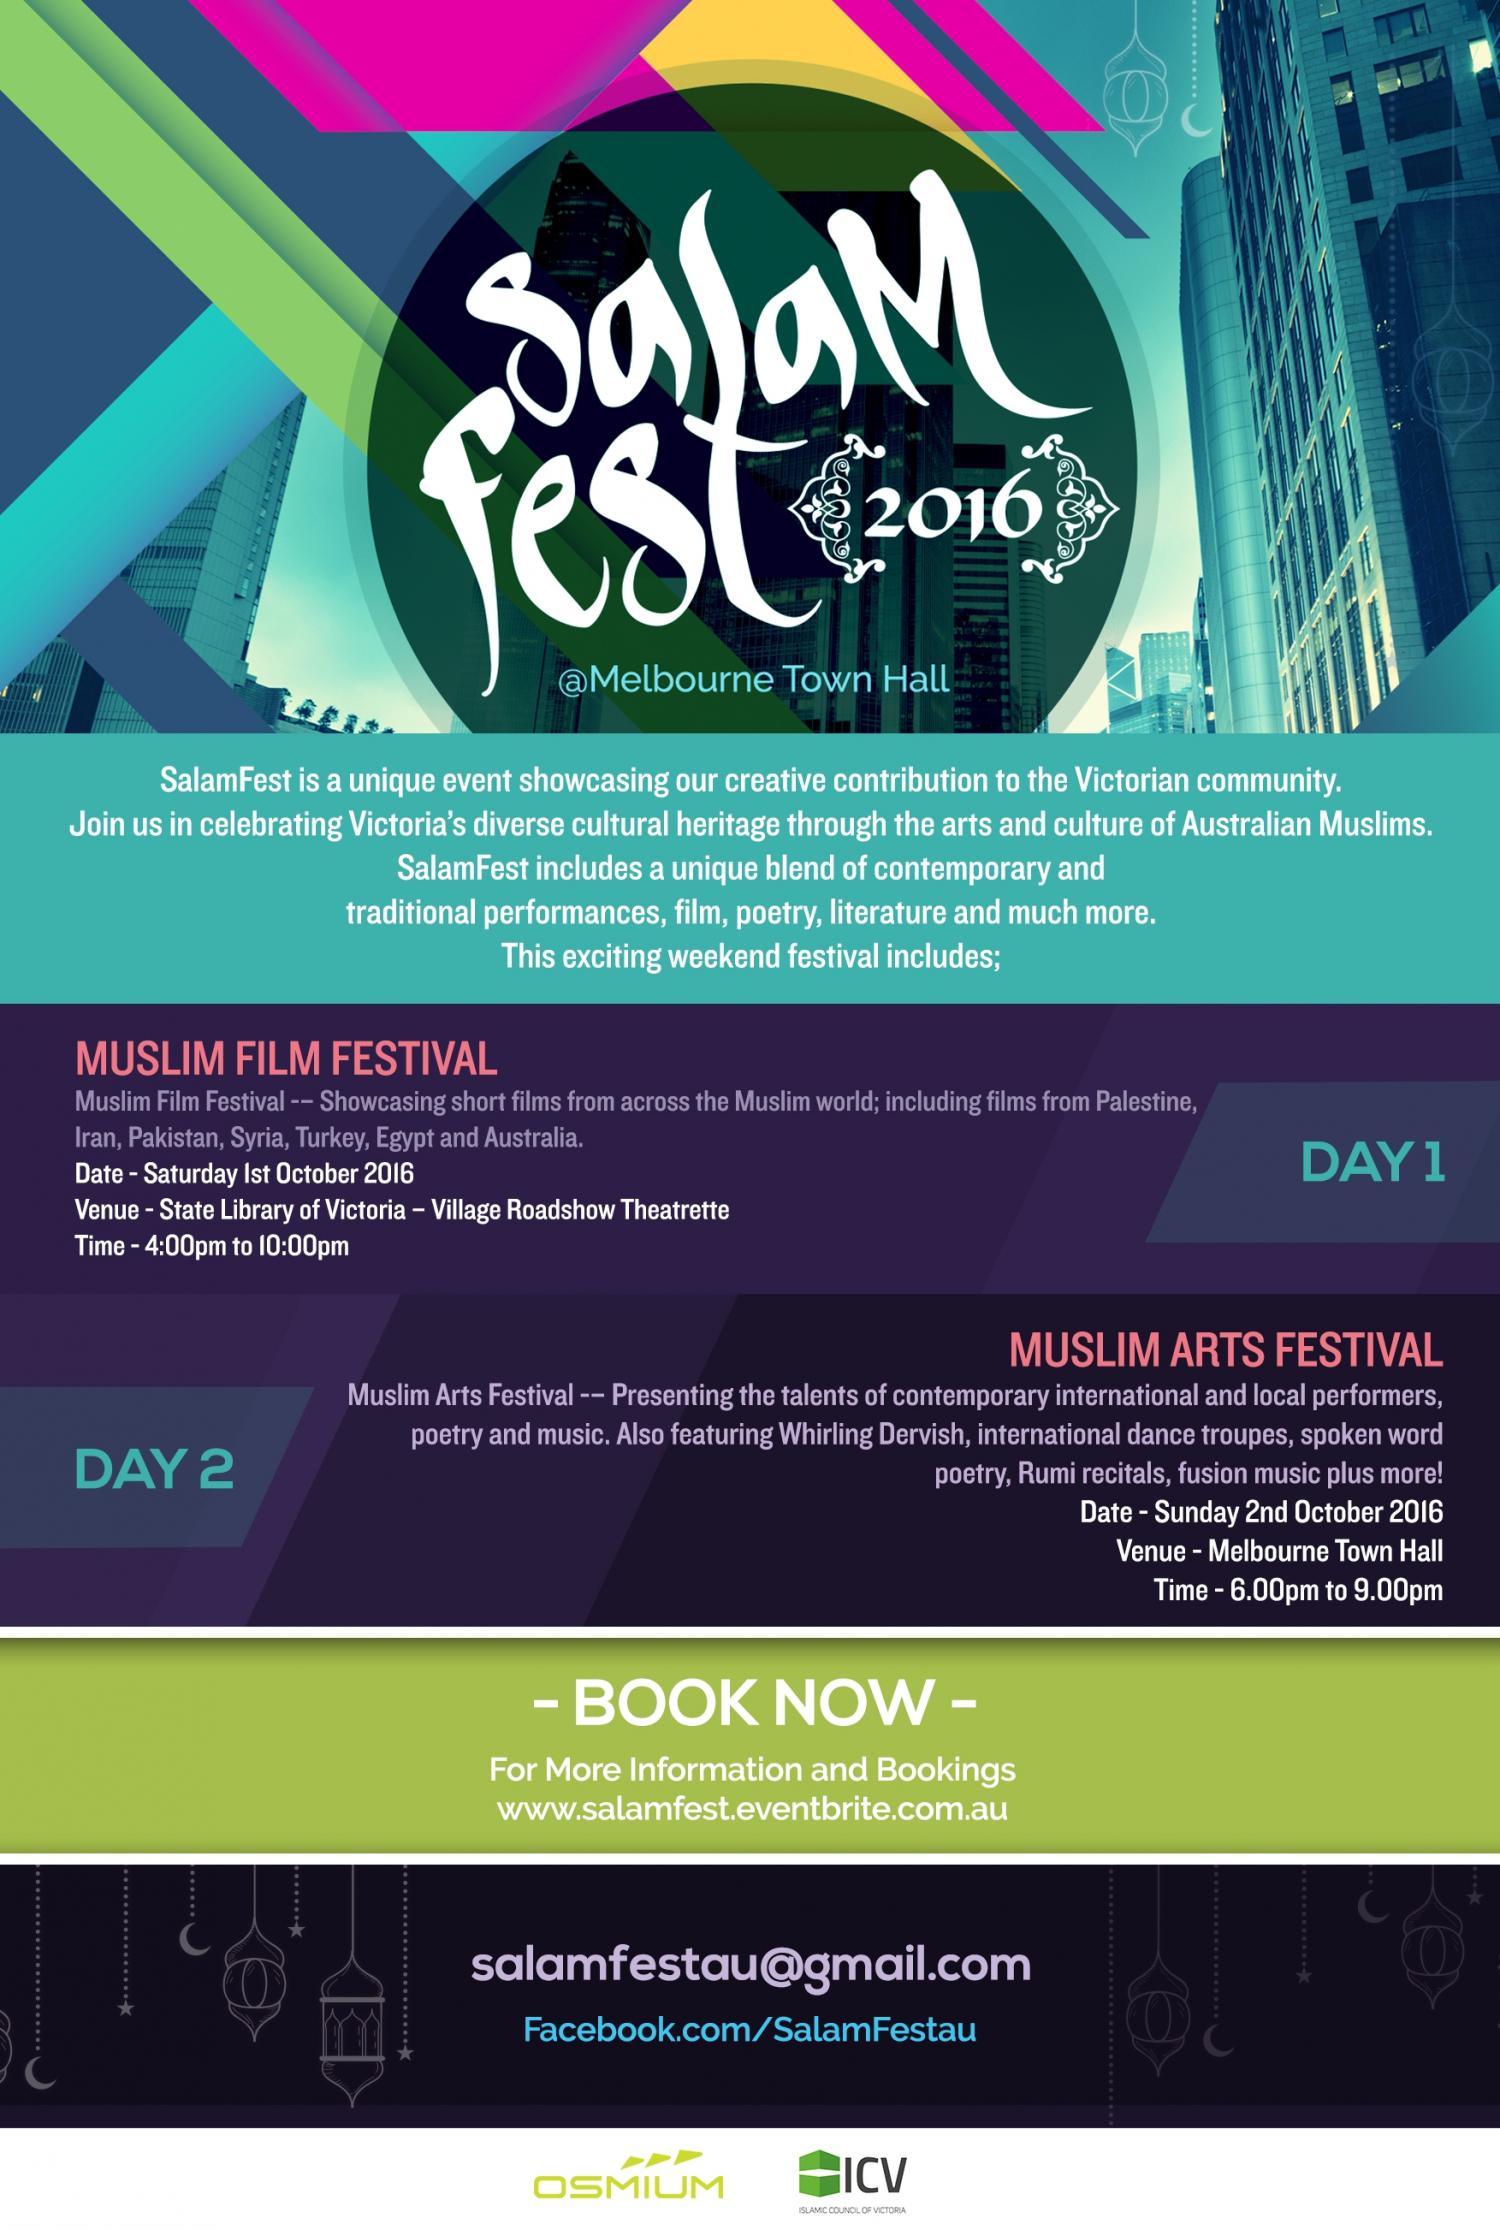 SalamFest 2016